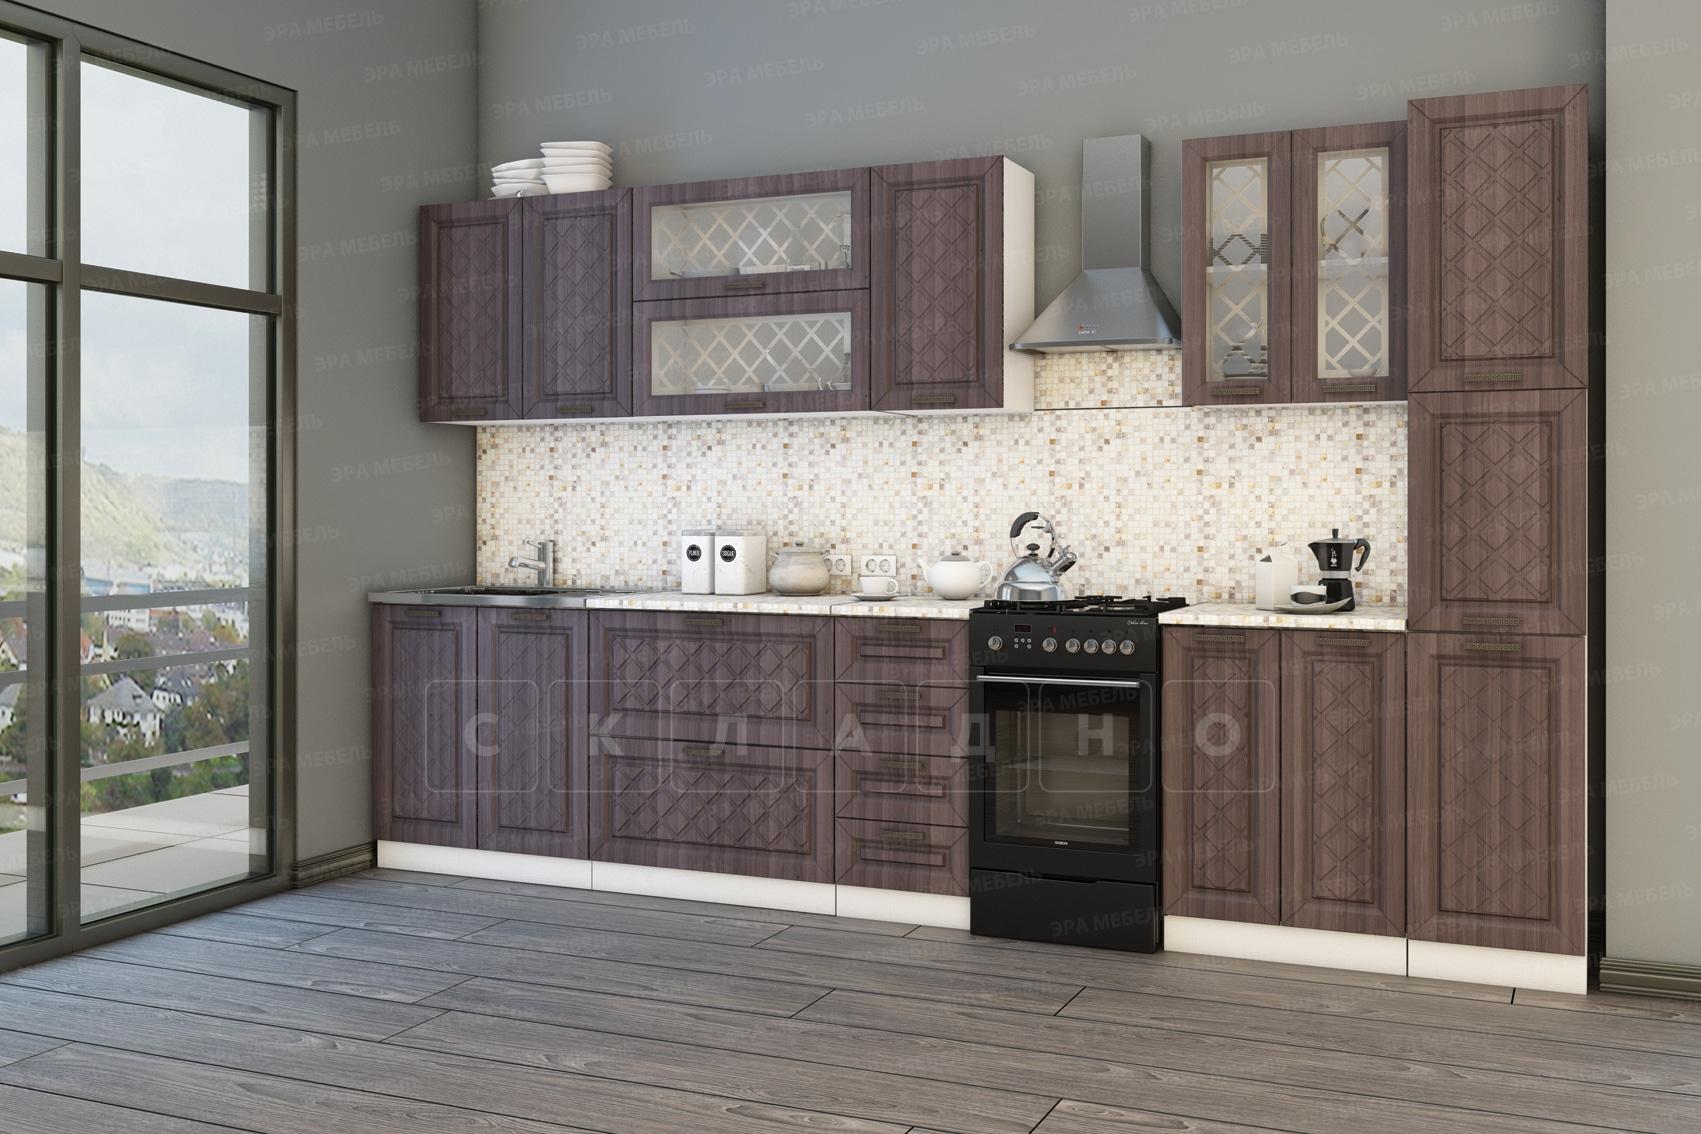 Кухонный гарнитур с пеналом Агава 3,0 м вариант 1 фото 2 | интернет-магазин Складно